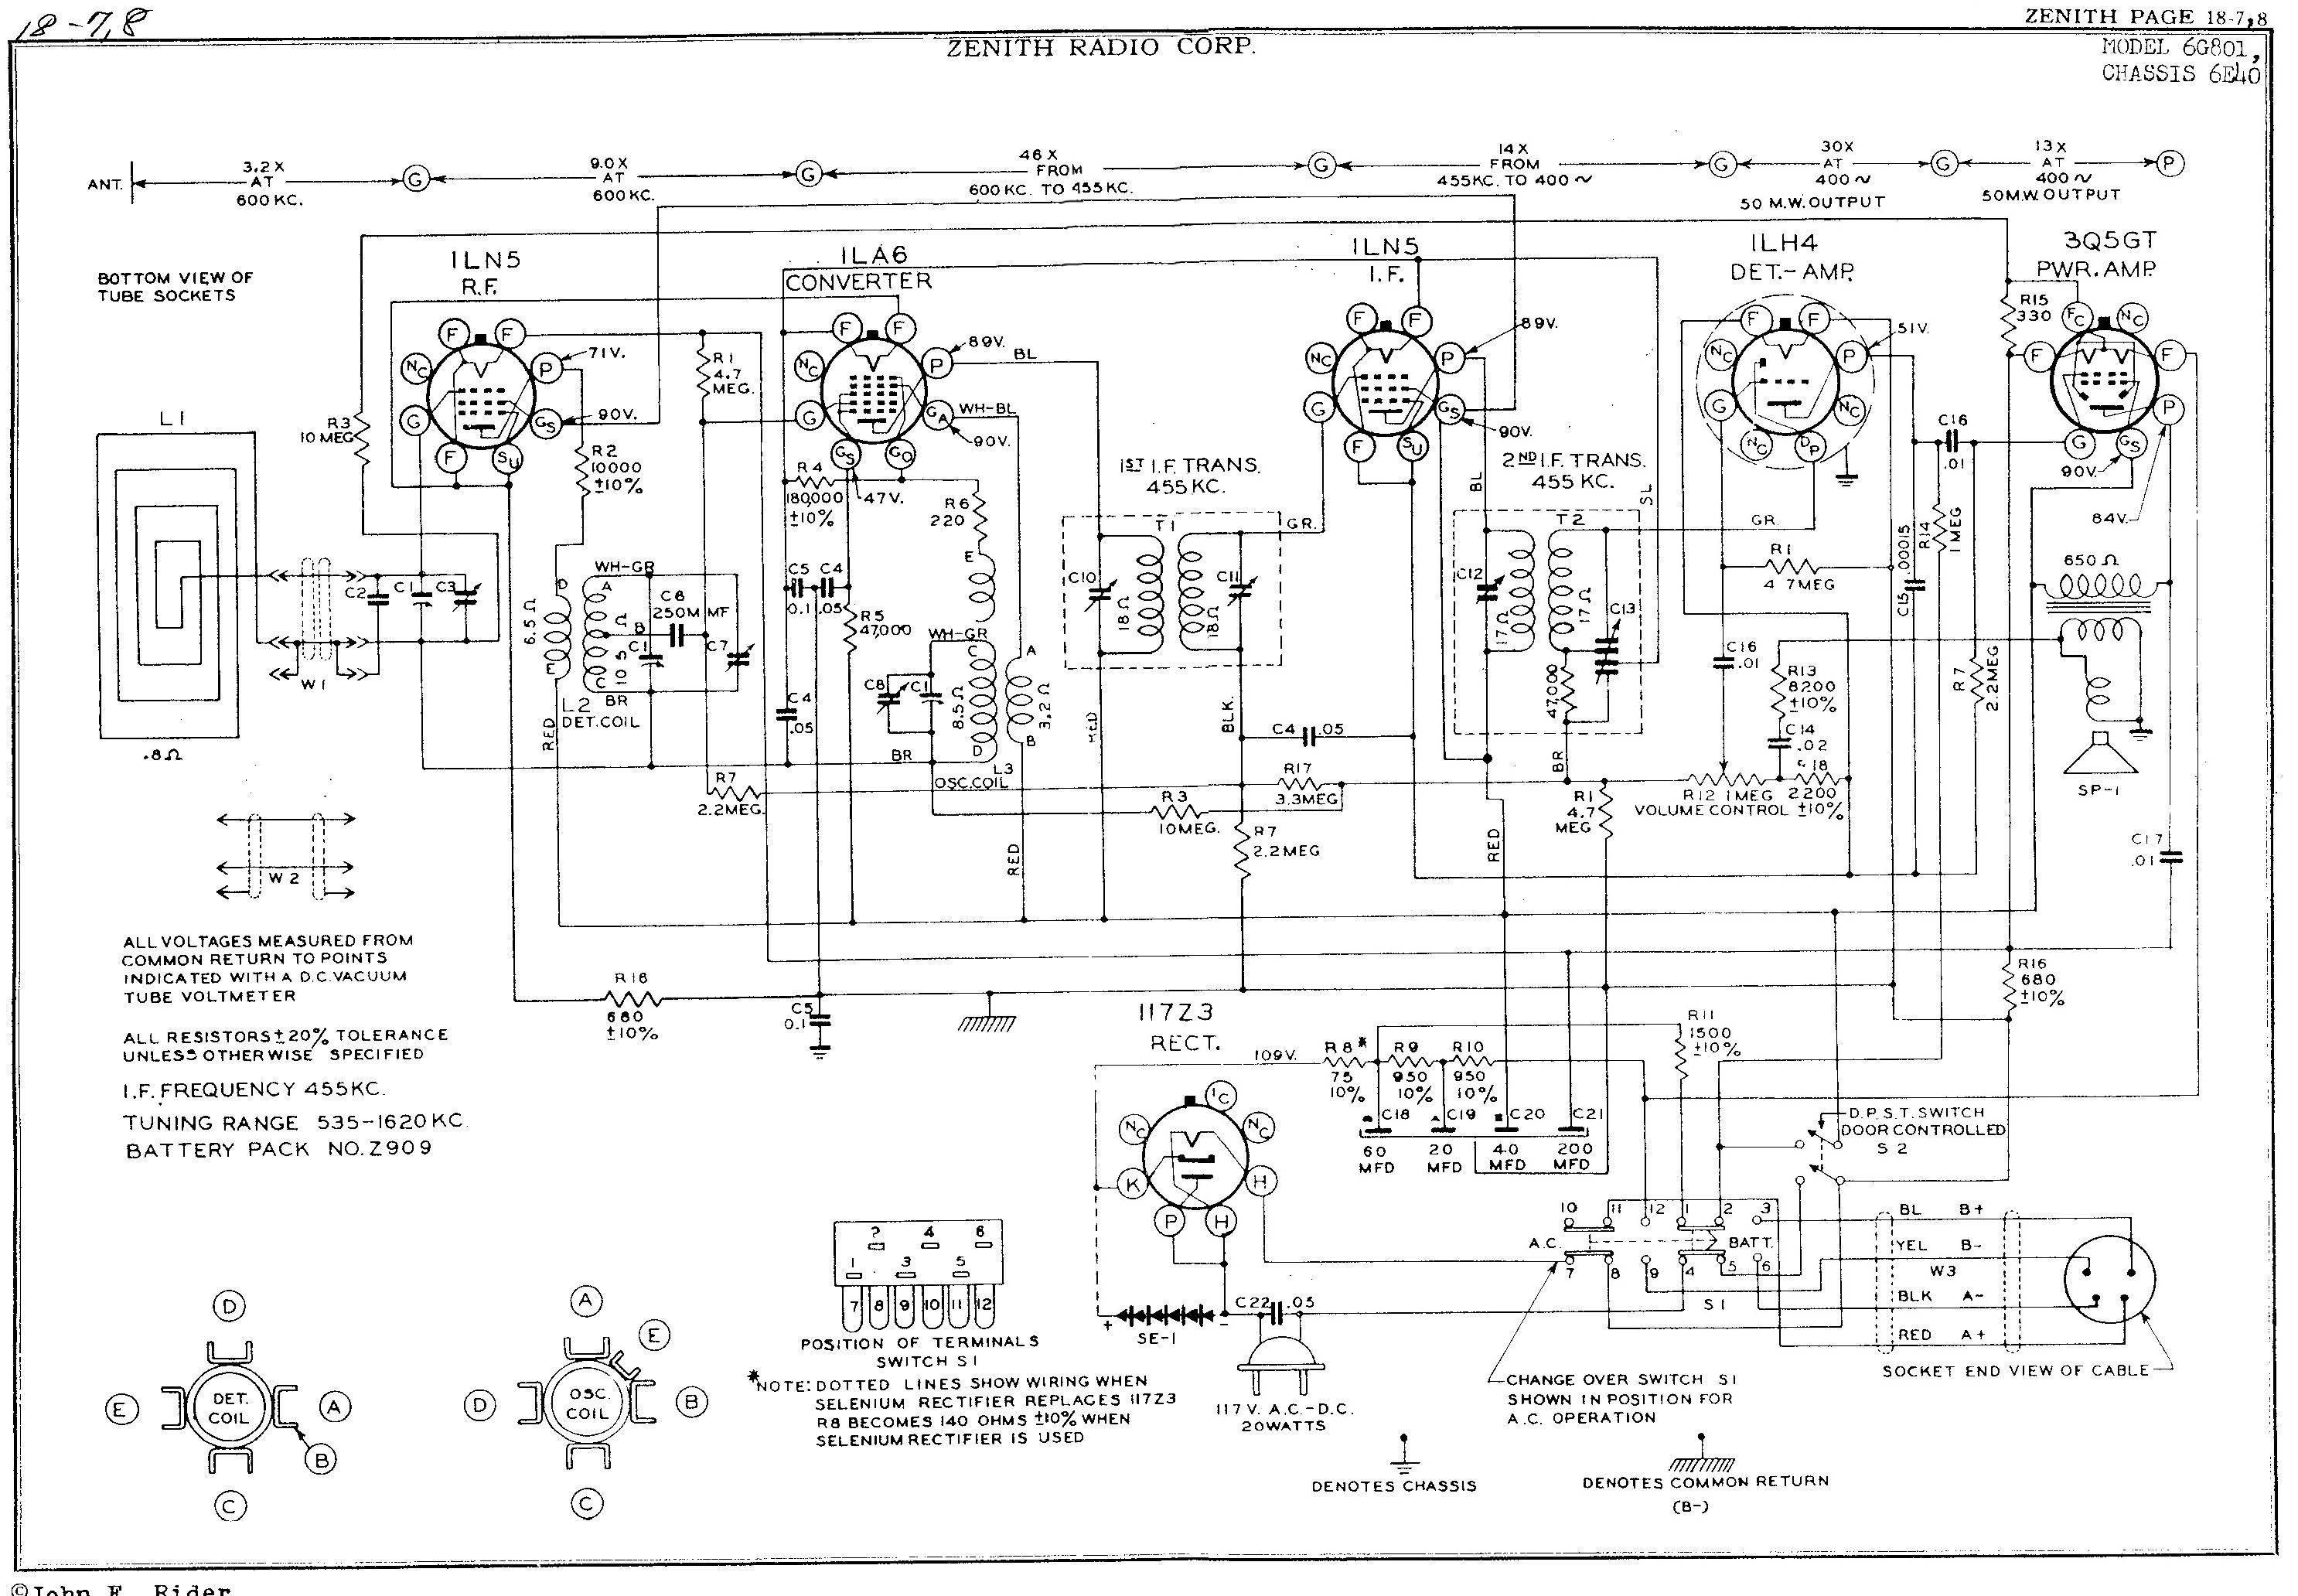 James's Zenith 6g801y Repairrestoration Project. Zenith 6g801y Schematic Click For Larger. Wiring. Zenith Tube Radio Schematics Model 6s At Scoala.co